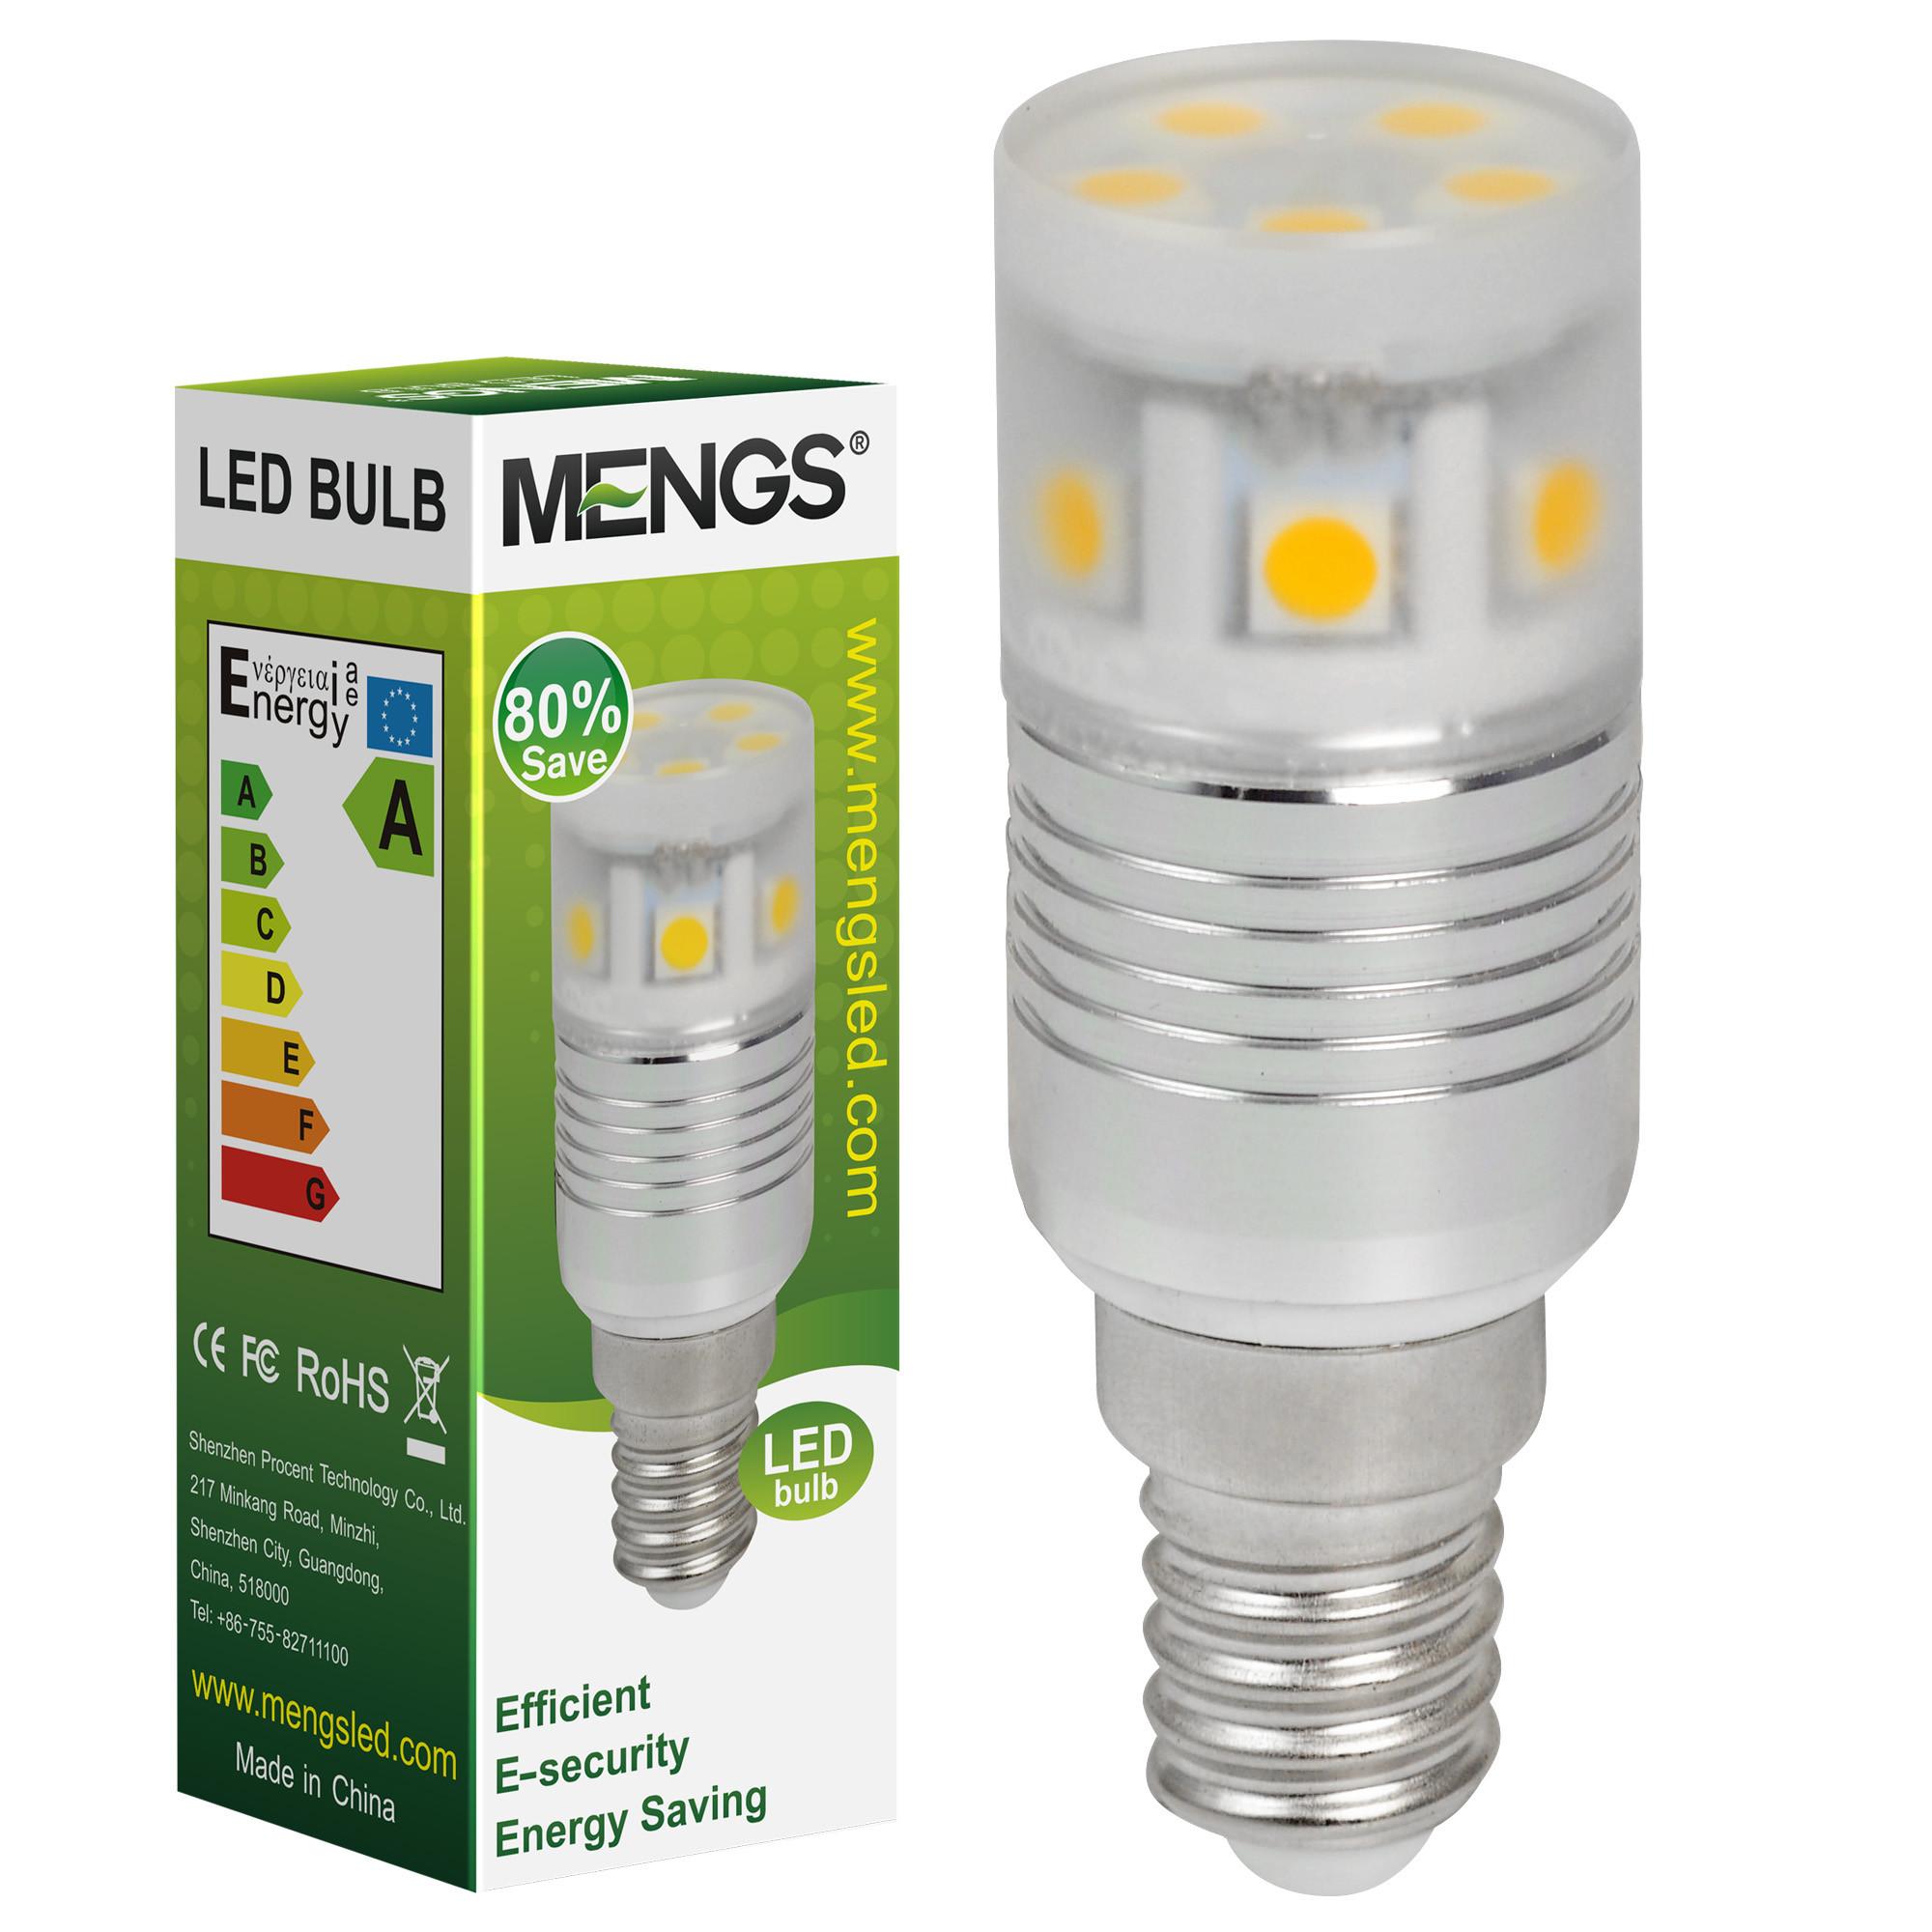 MENGS® E14 2.5W LED Corn Light 11x 5050 SMD LEDs LED Lamp Bulb In Cool White Energy-Saving Lamp